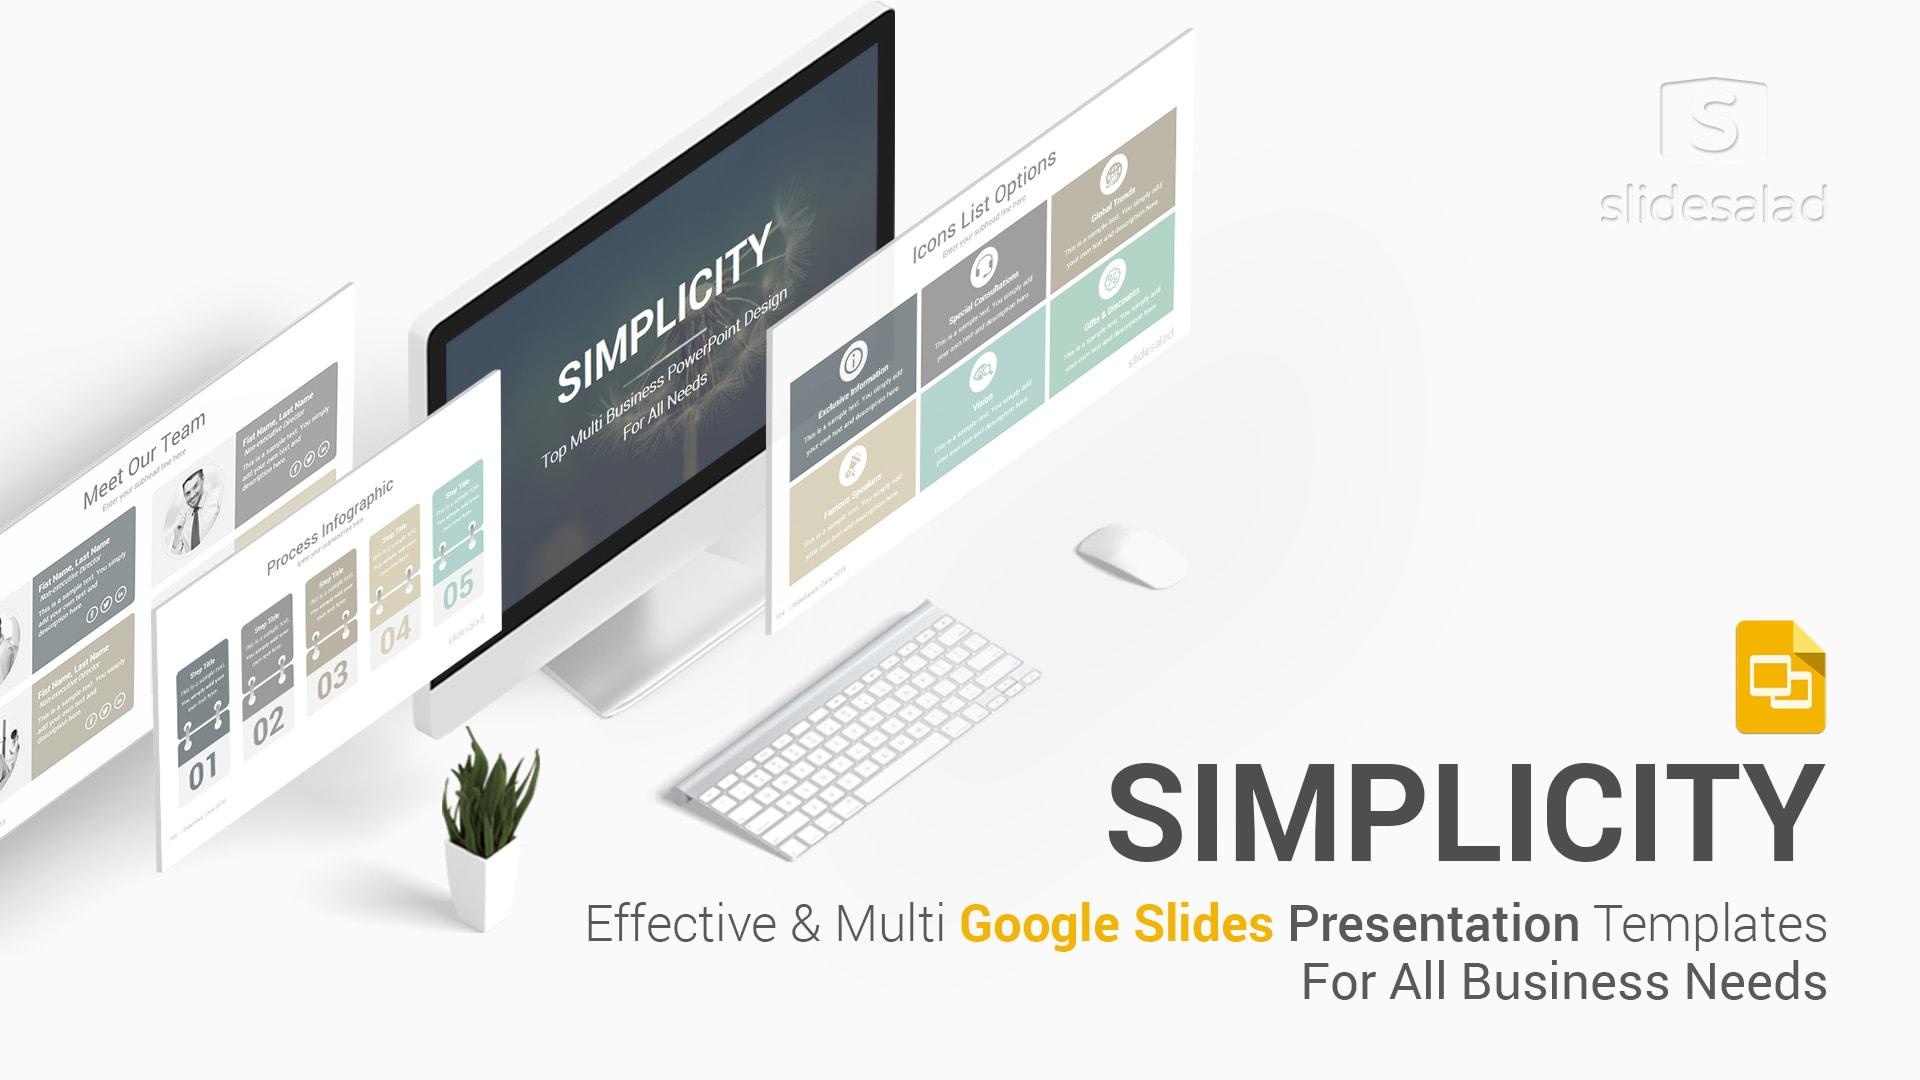 Simplicity Professional Business Google Slides Templates - Google Slides Minimal Template